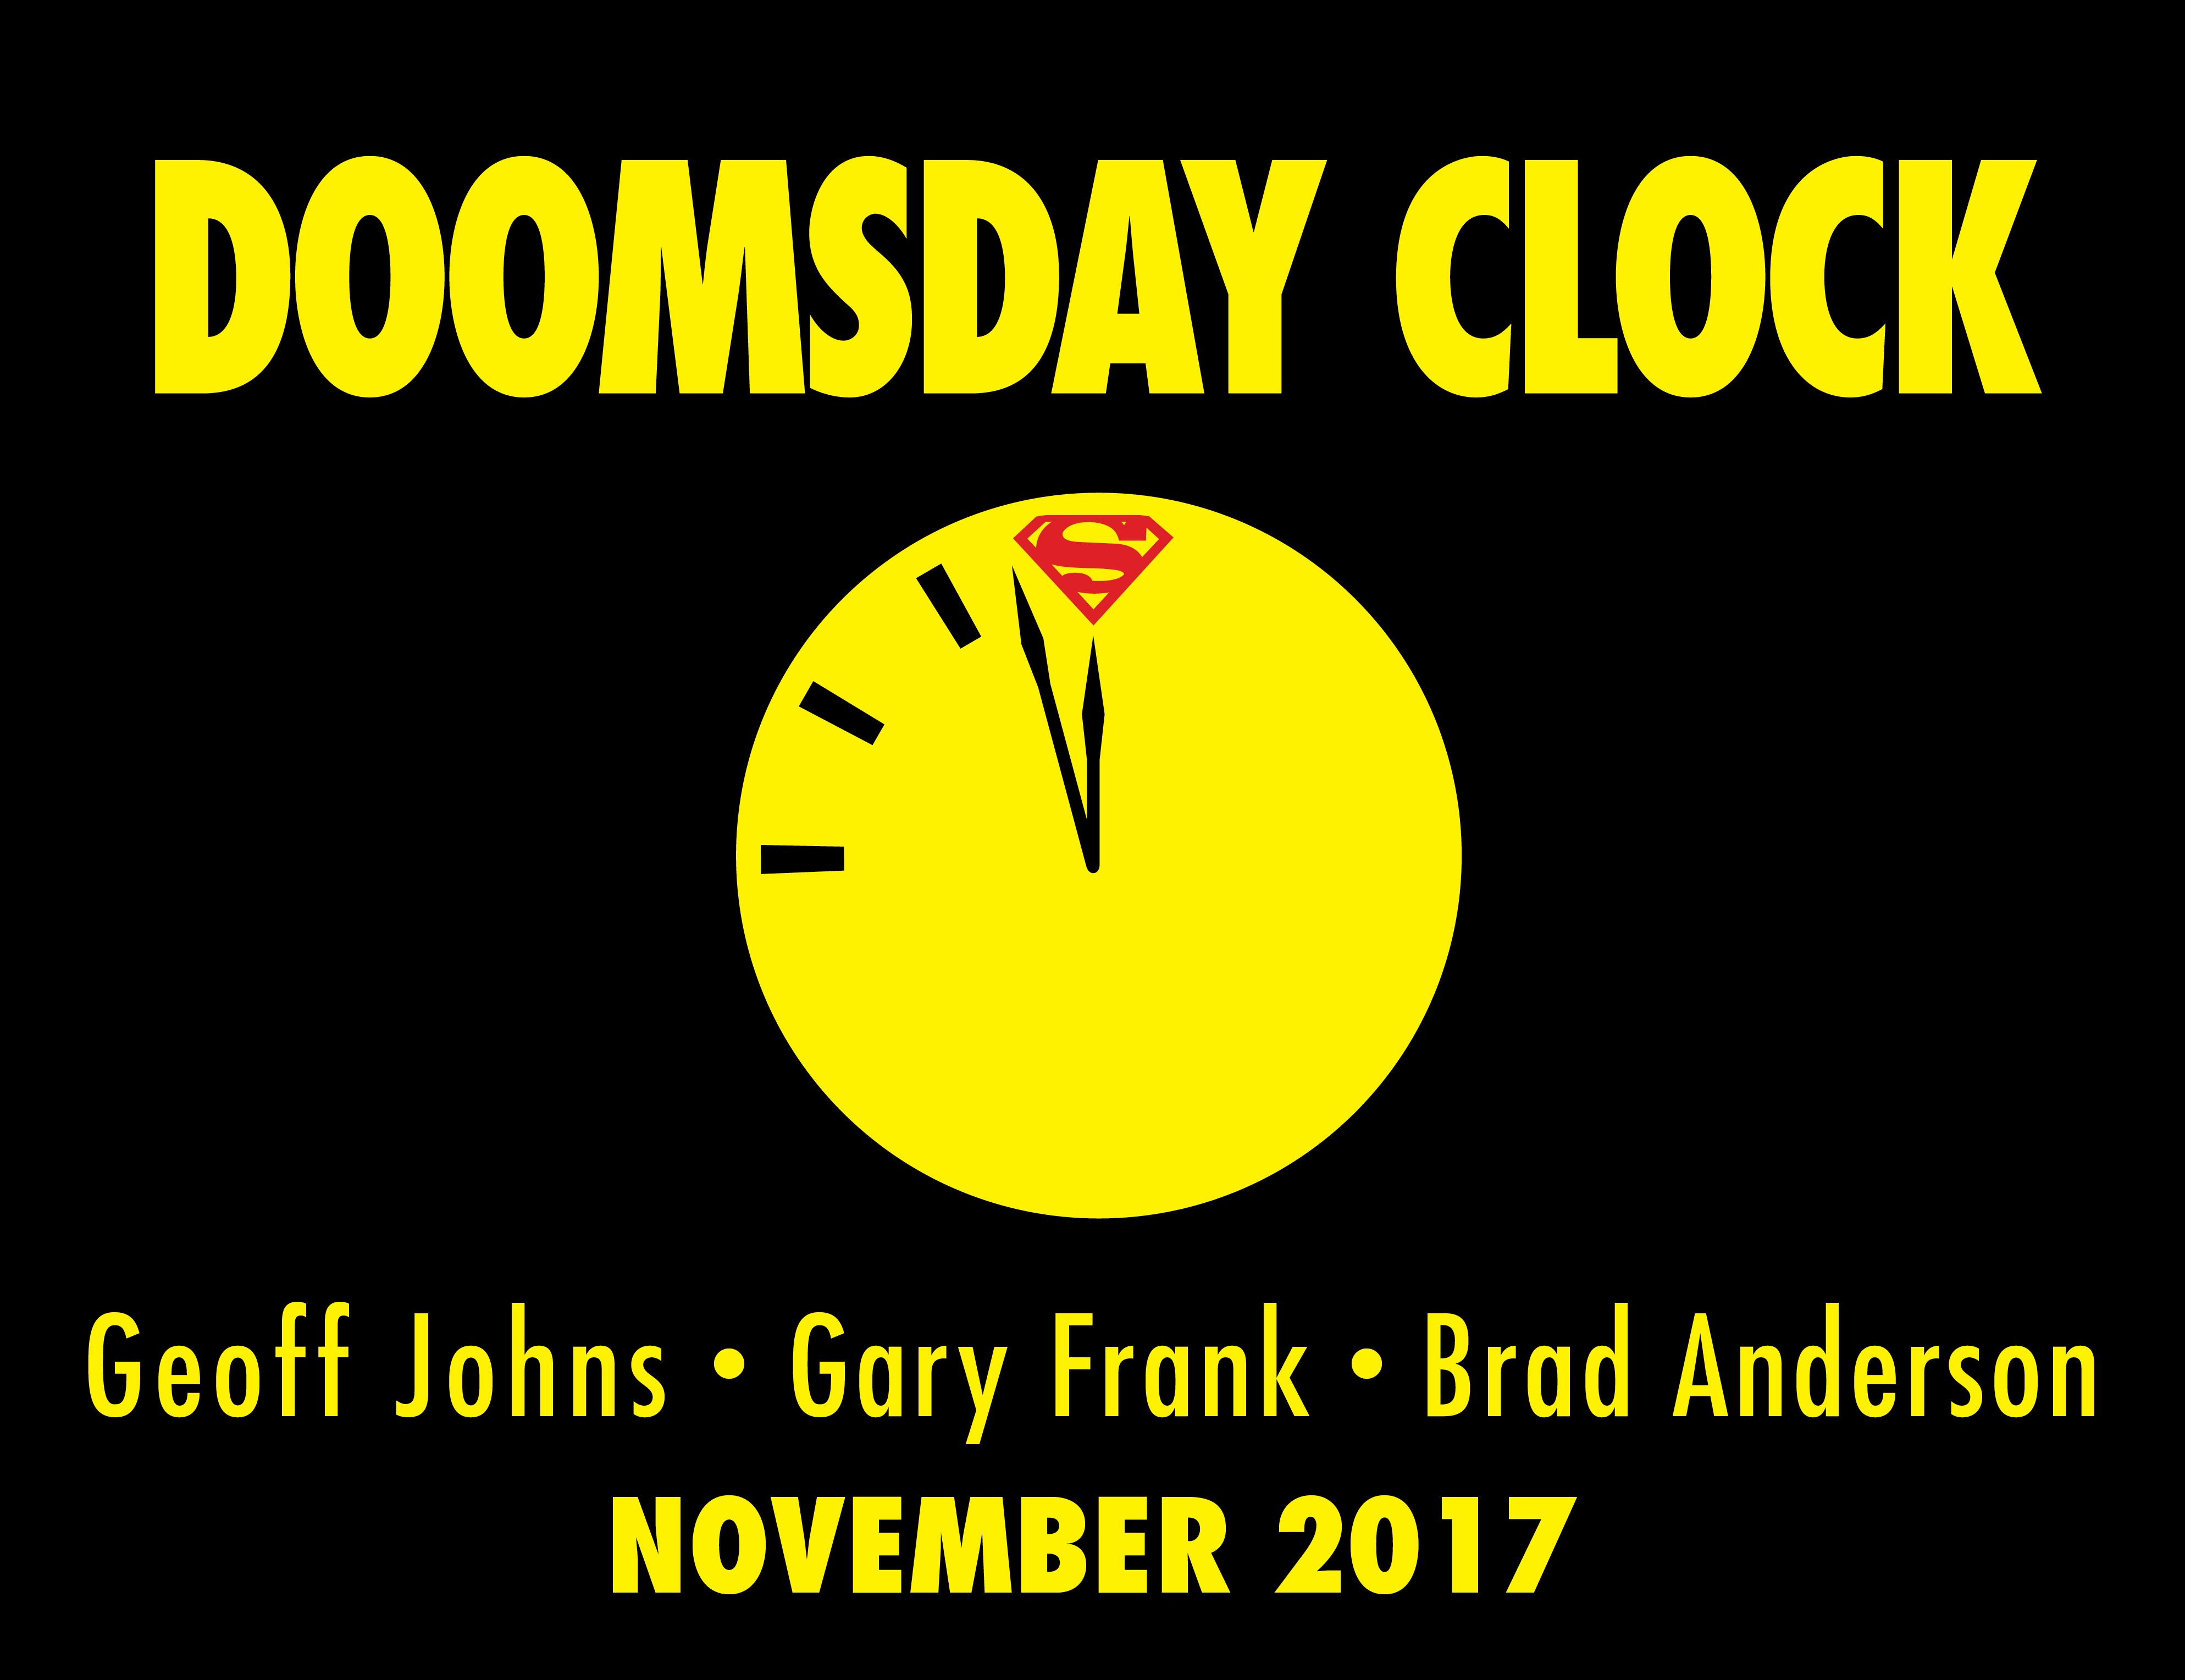 DOOMSDAY CLOCK GuejxBRH